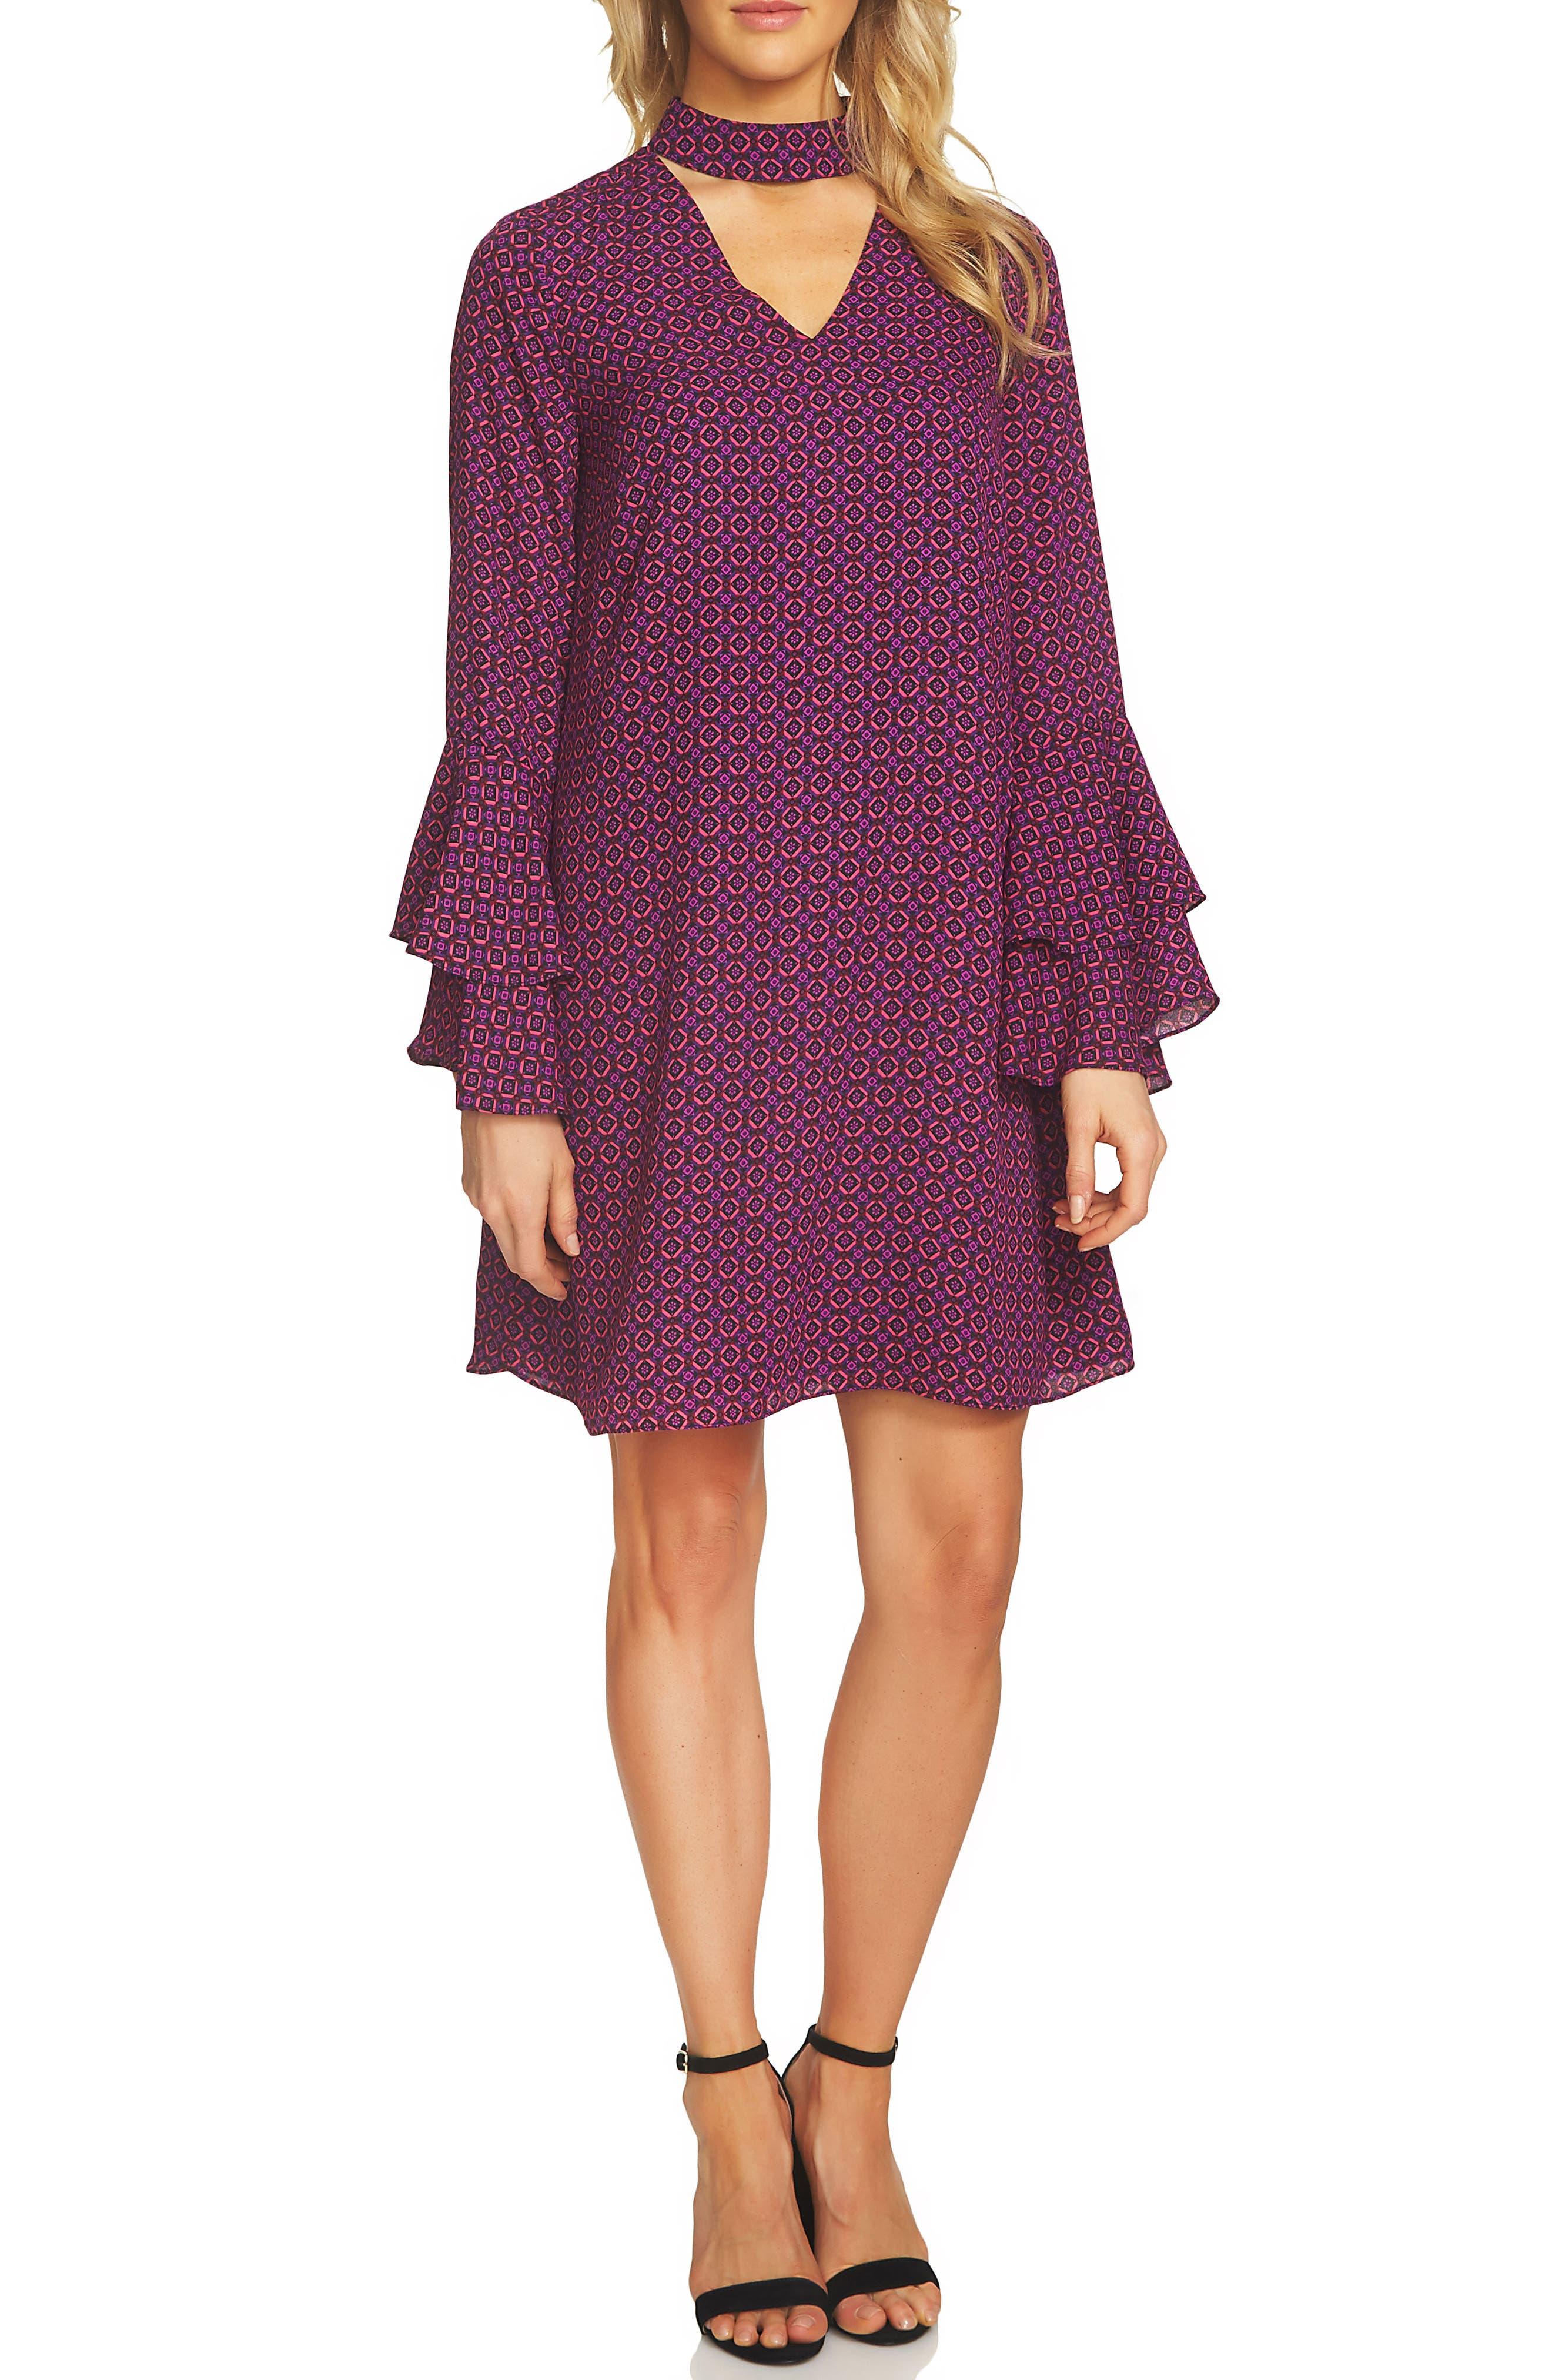 Choker Bell Sleeve Dress,                             Main thumbnail 1, color,                             Vibrant Cerise